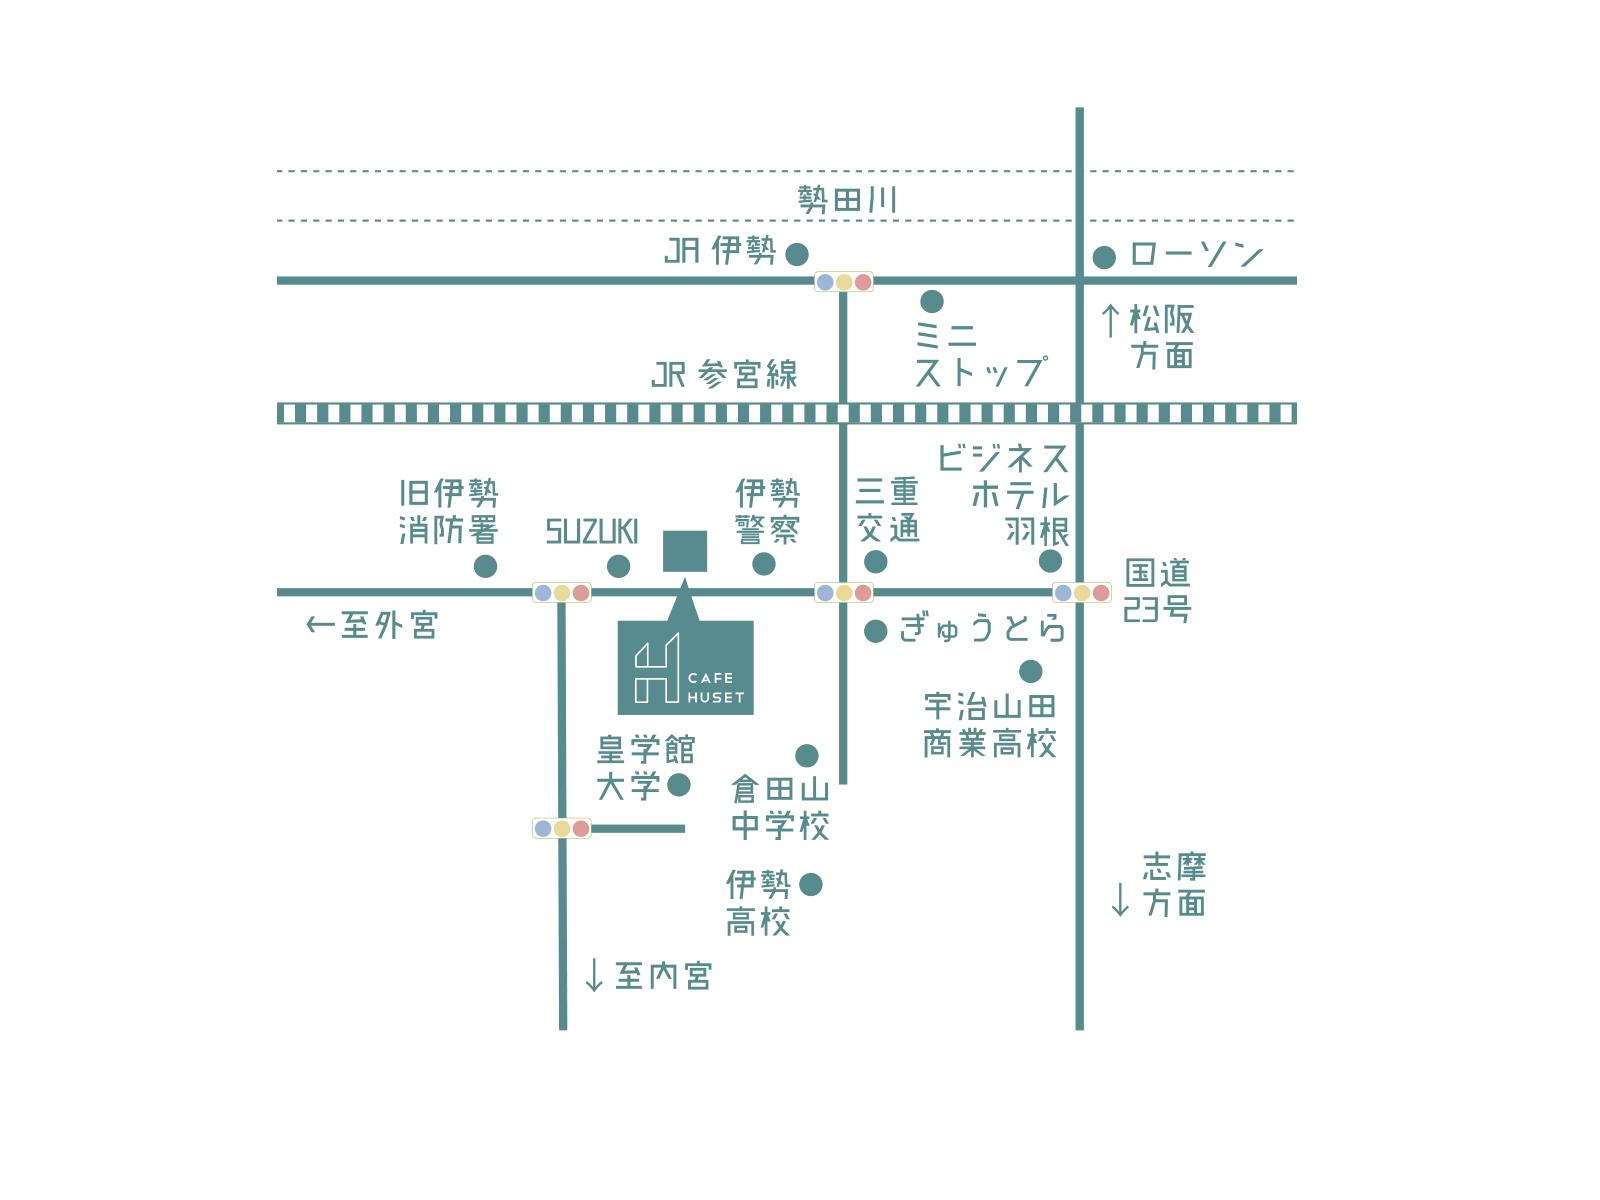 cafe huset map